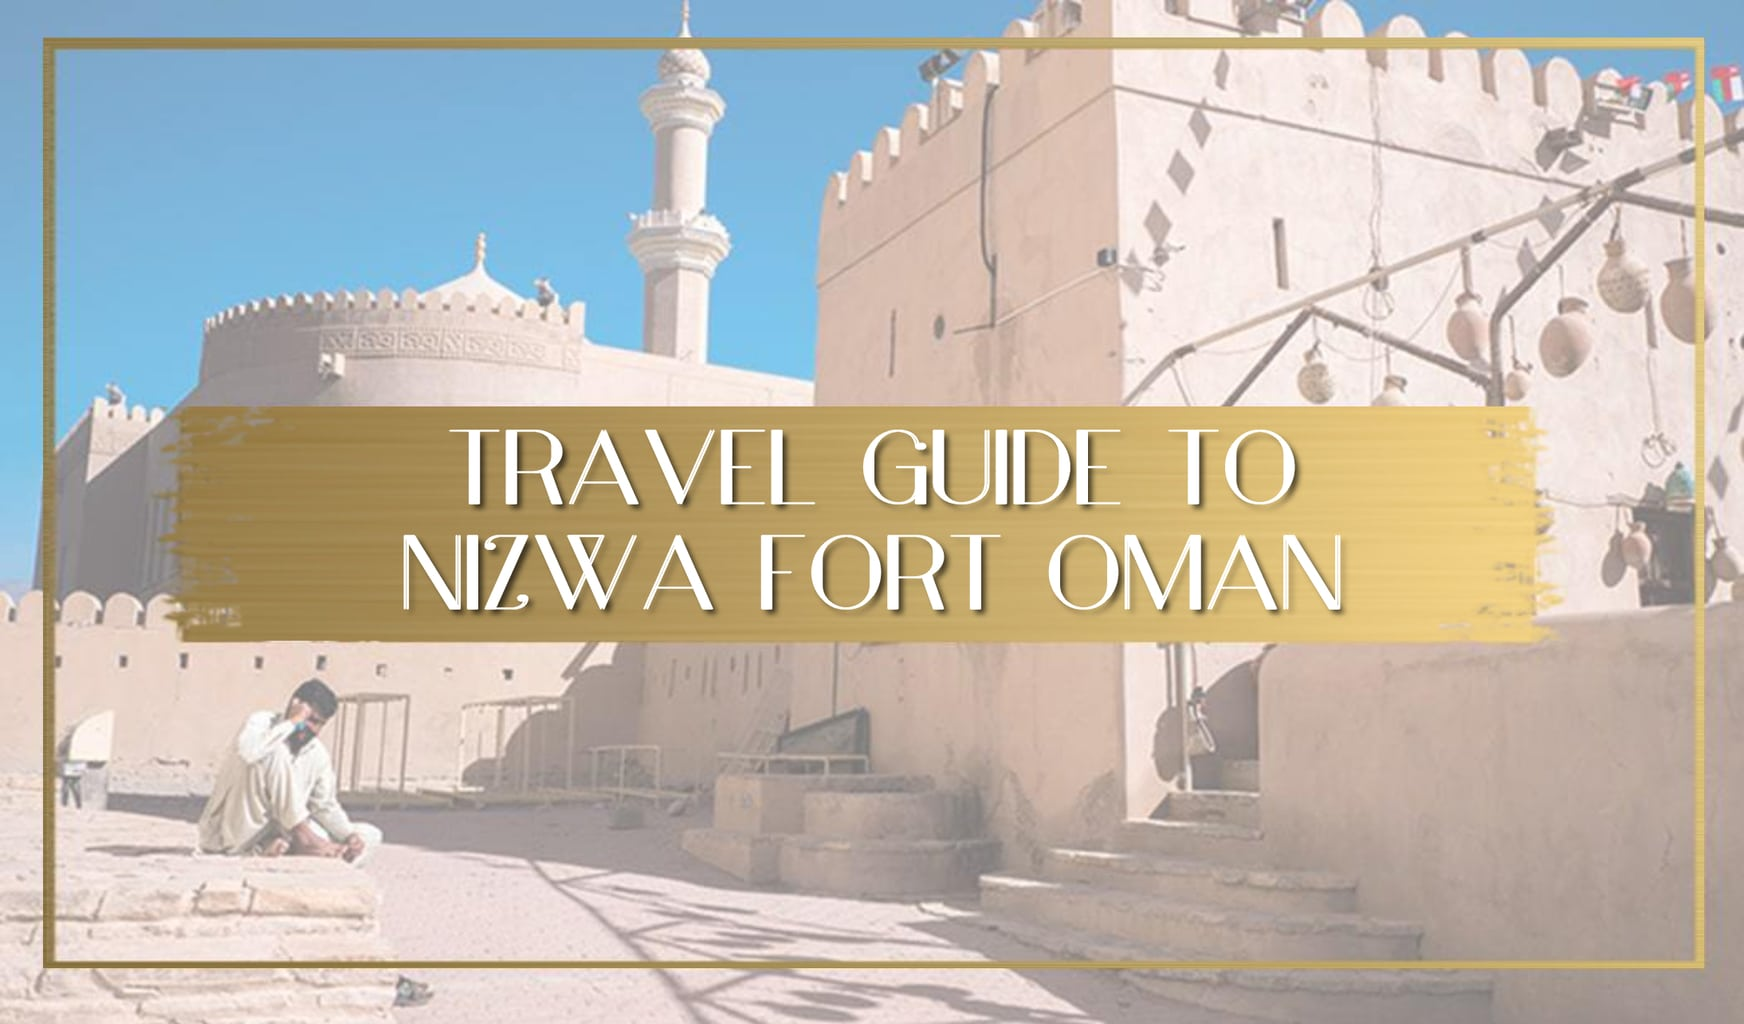 Guide to Nizwa Fort Oman main